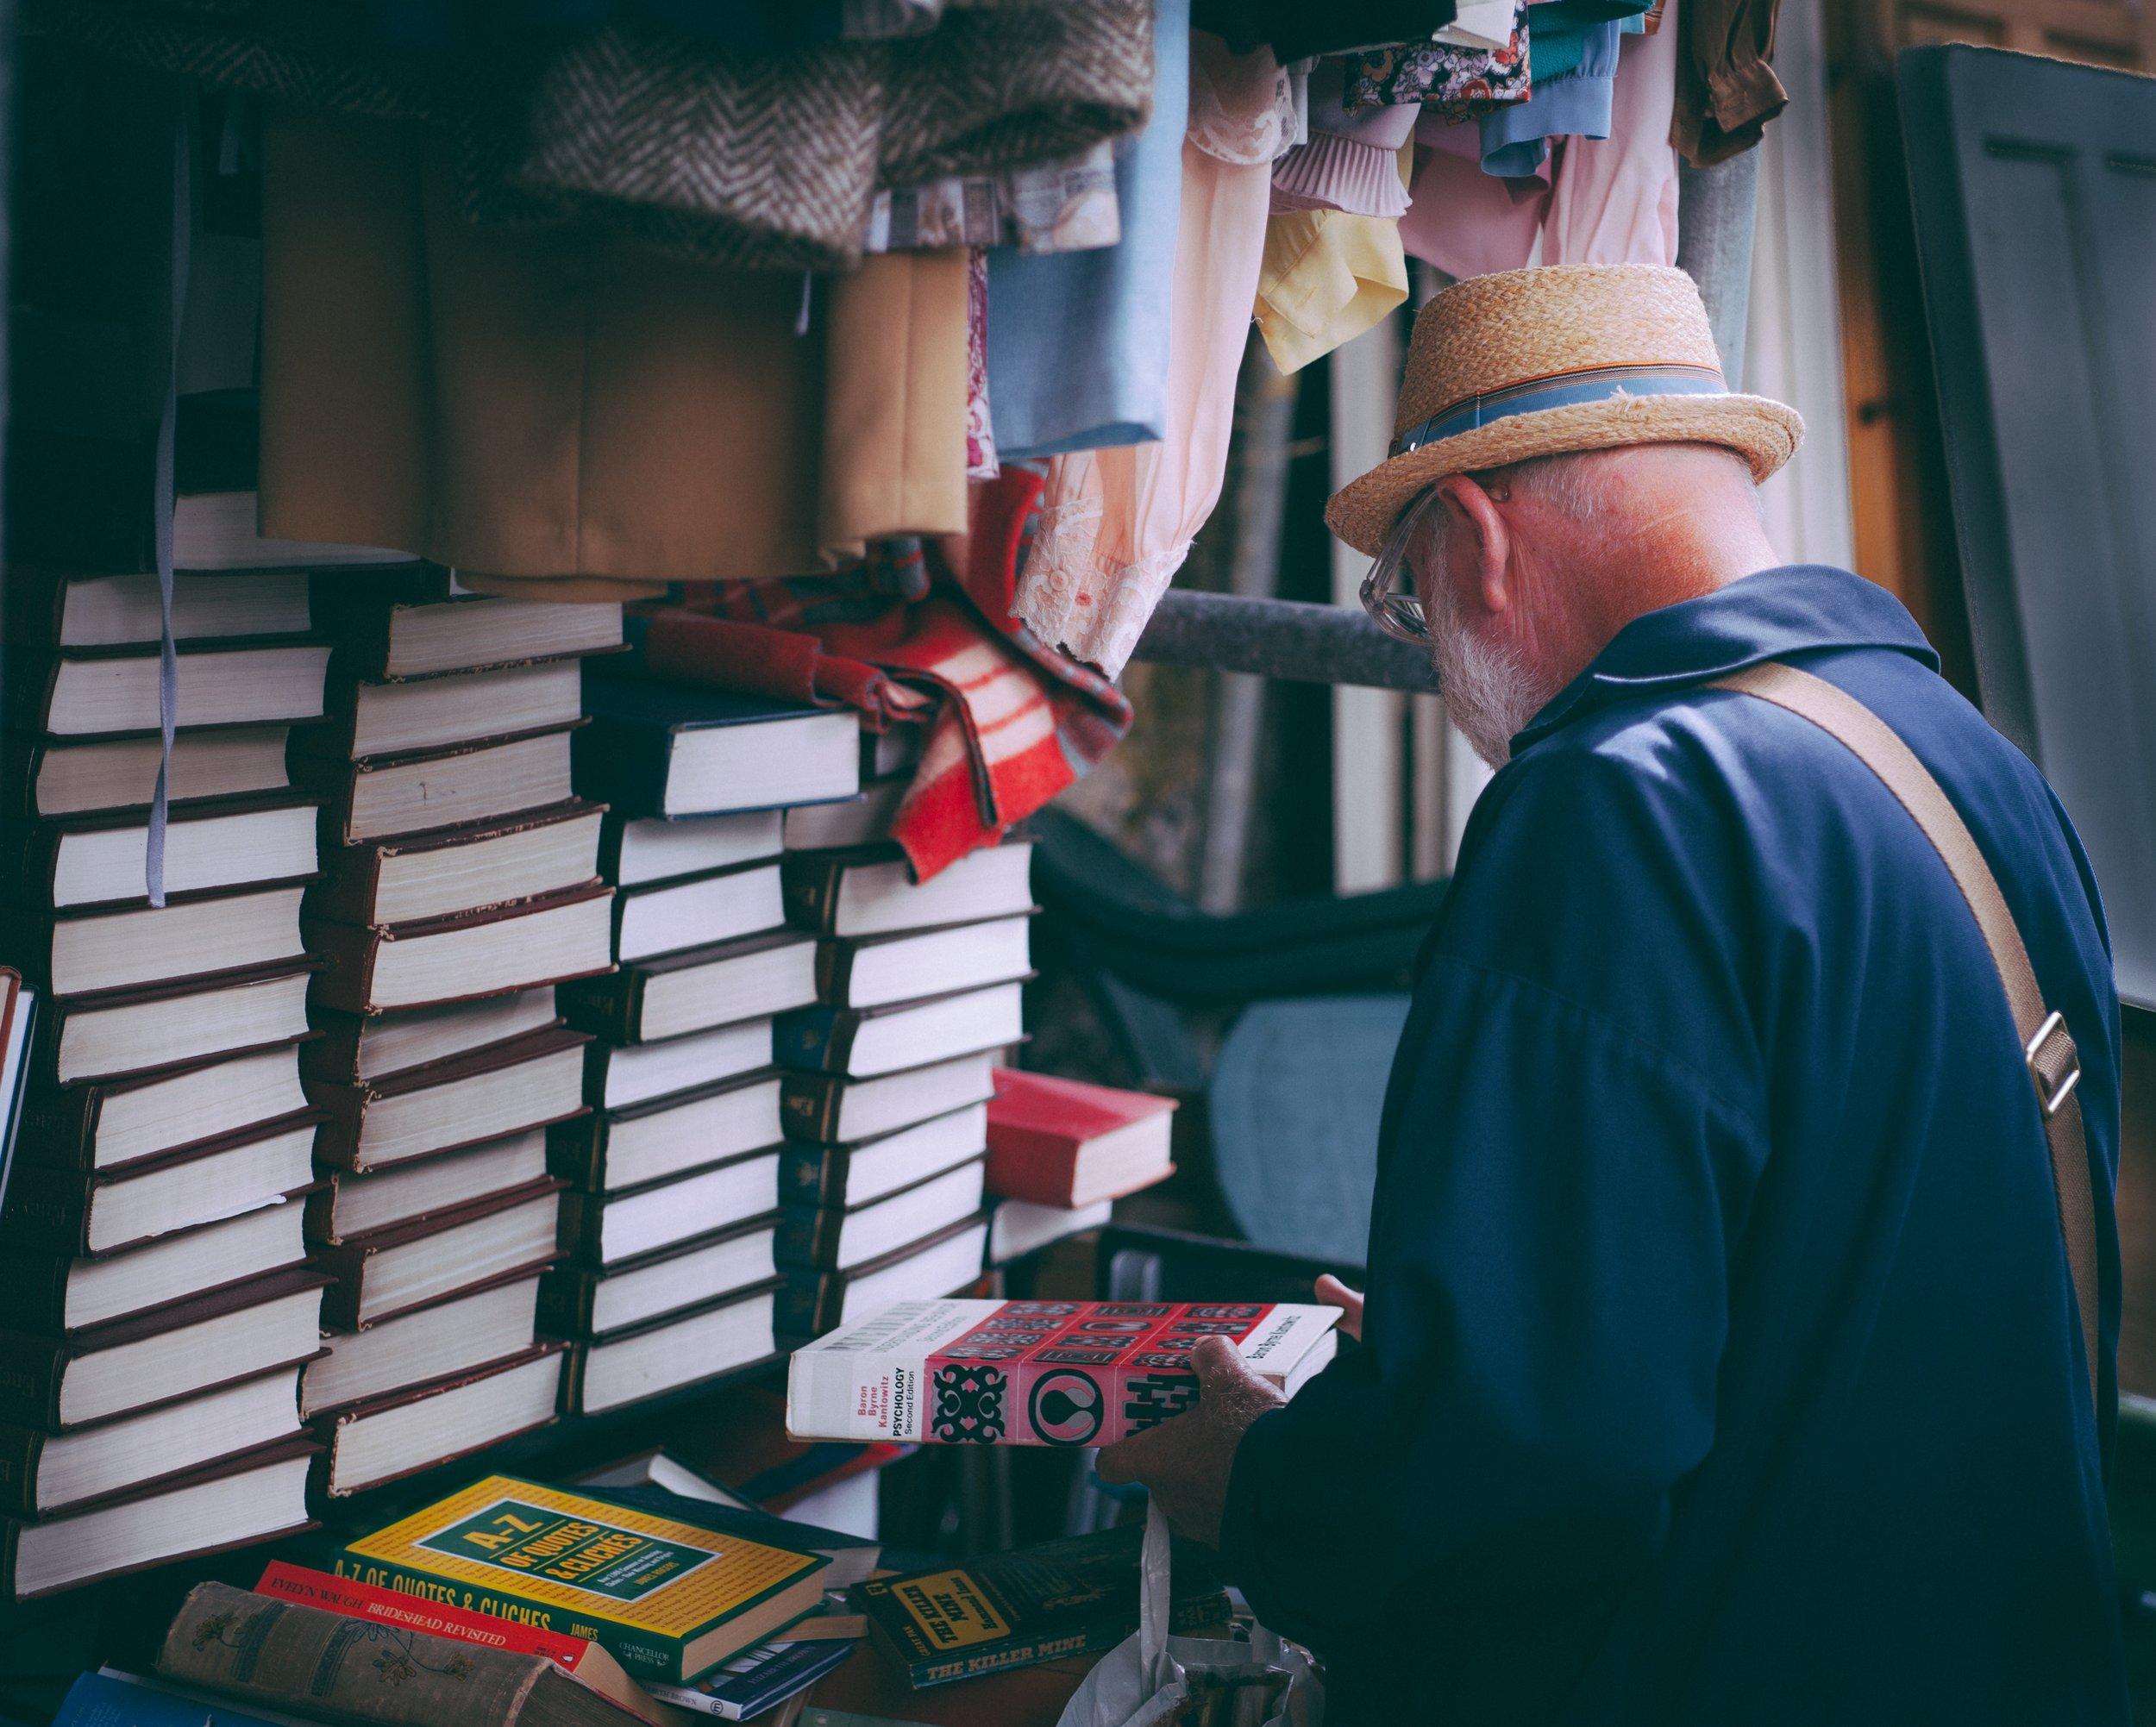 5 Ways to Make Money in College - books